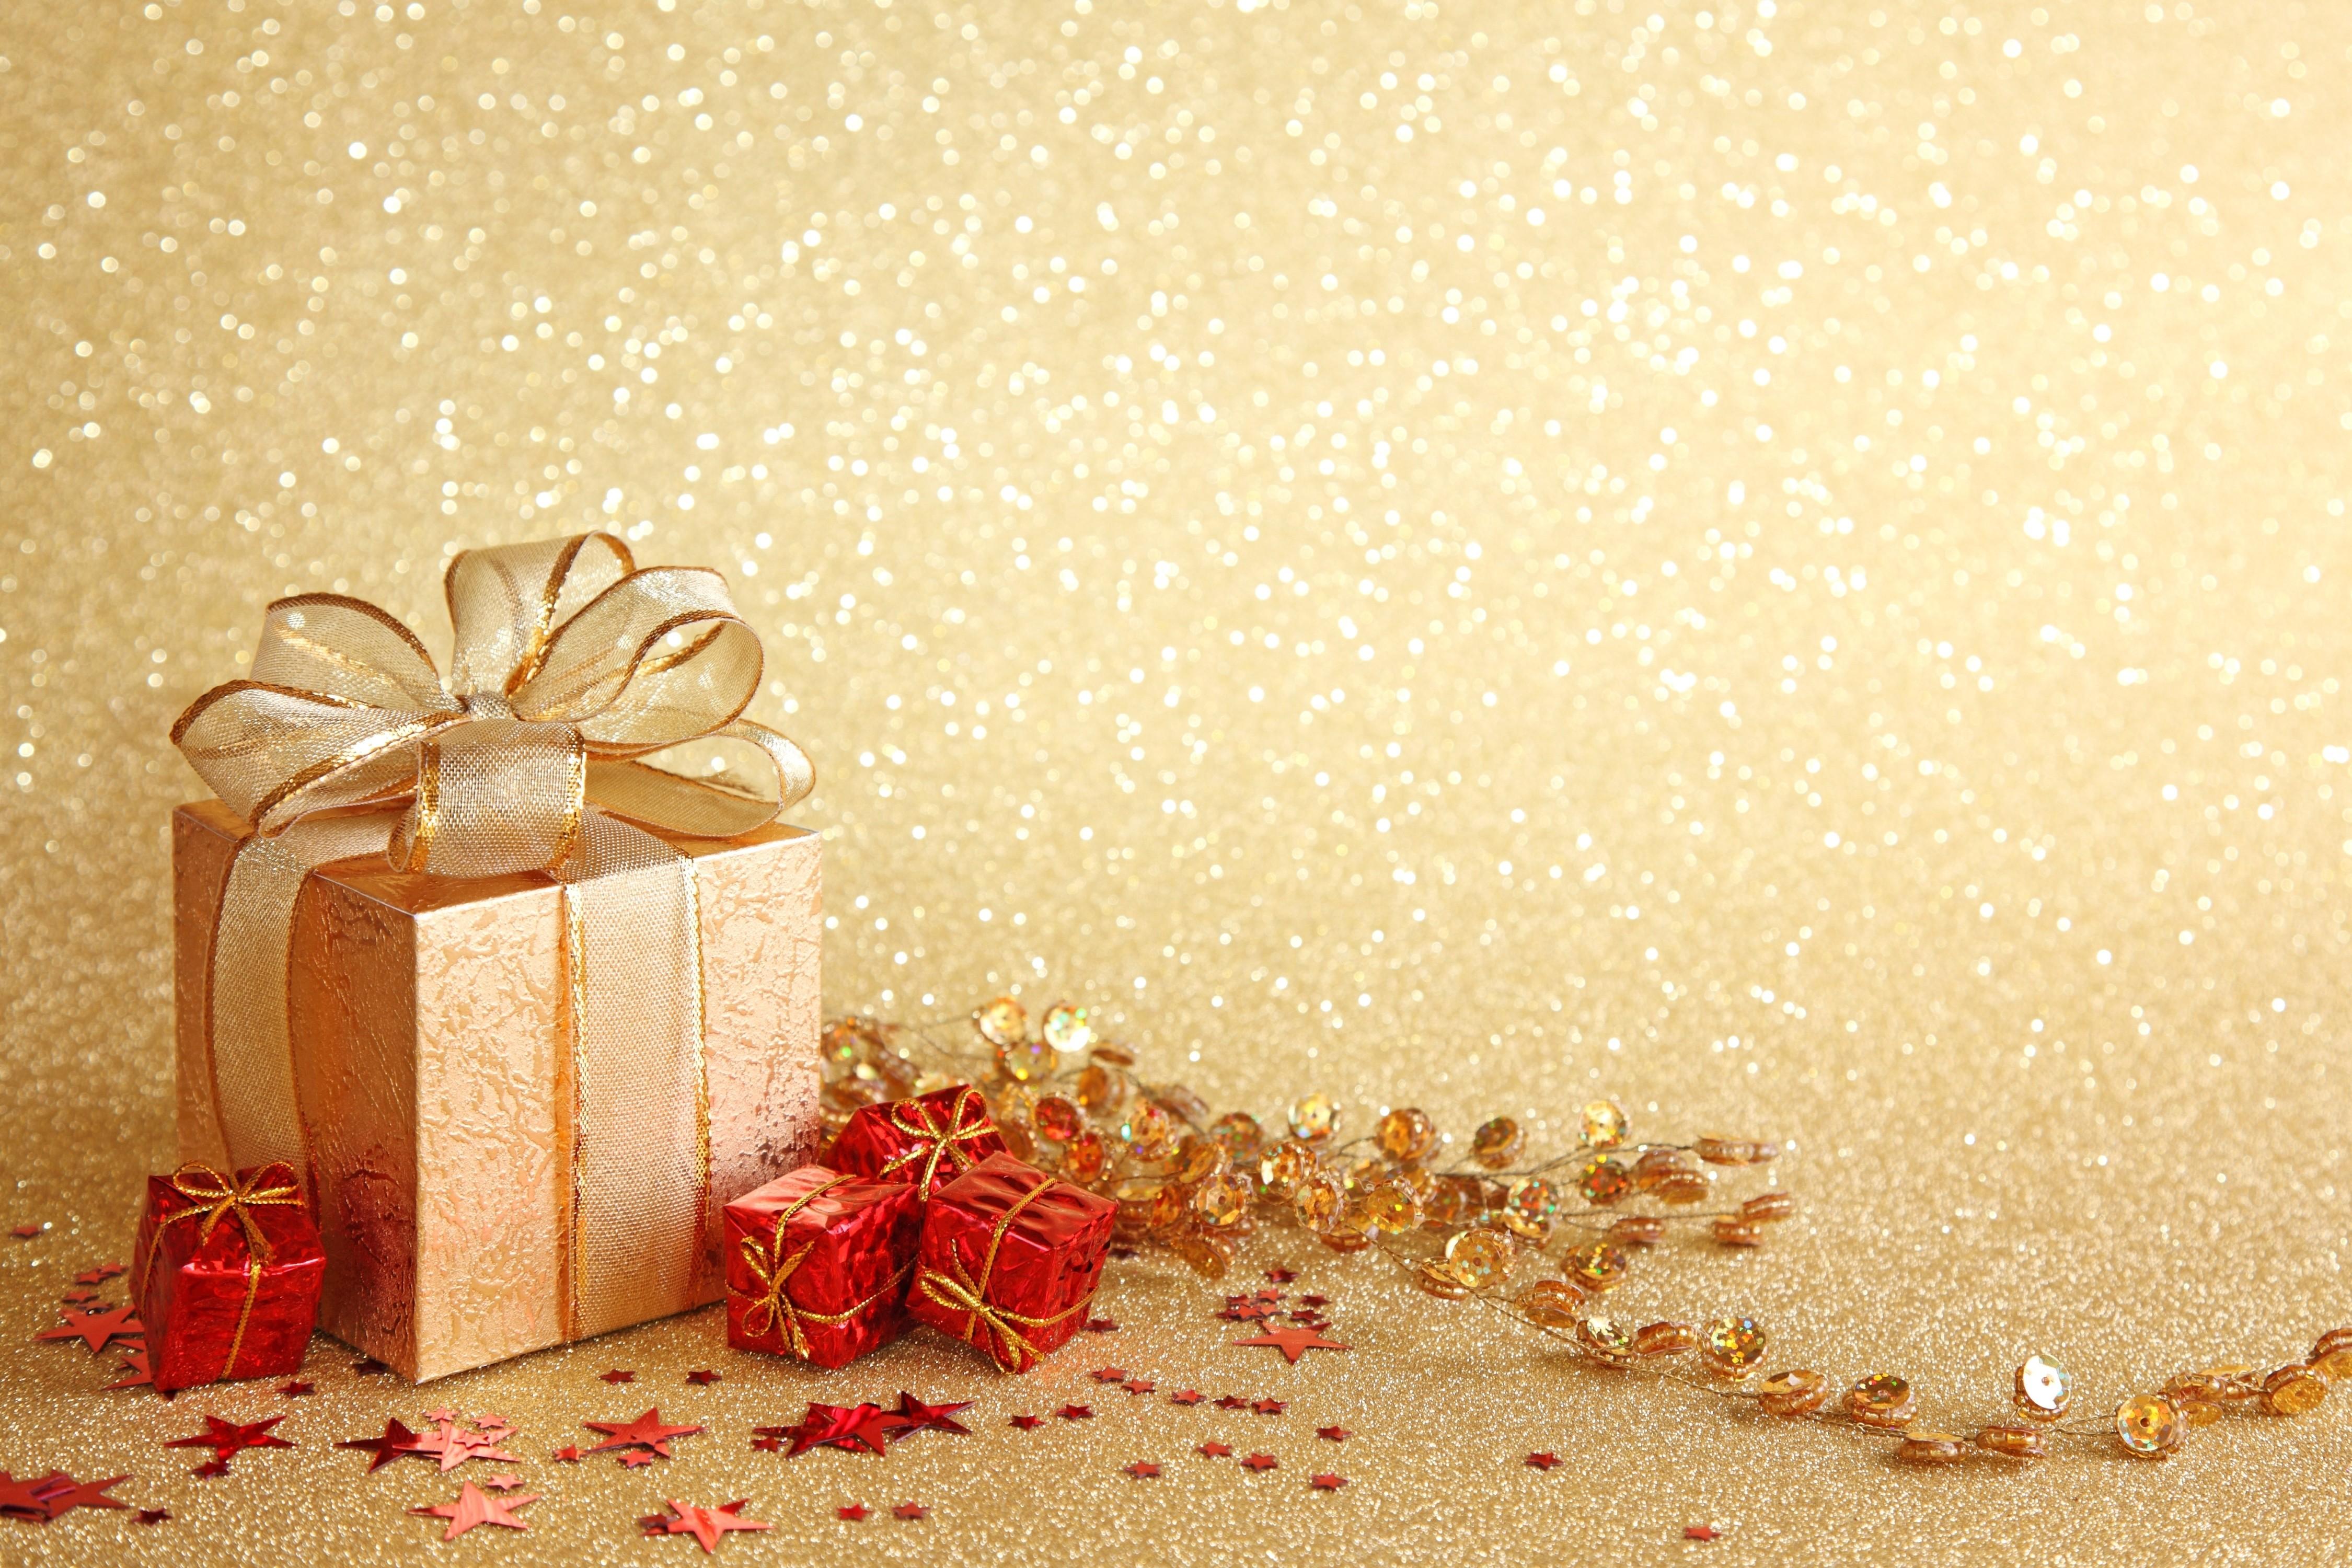 Golden gift background photo